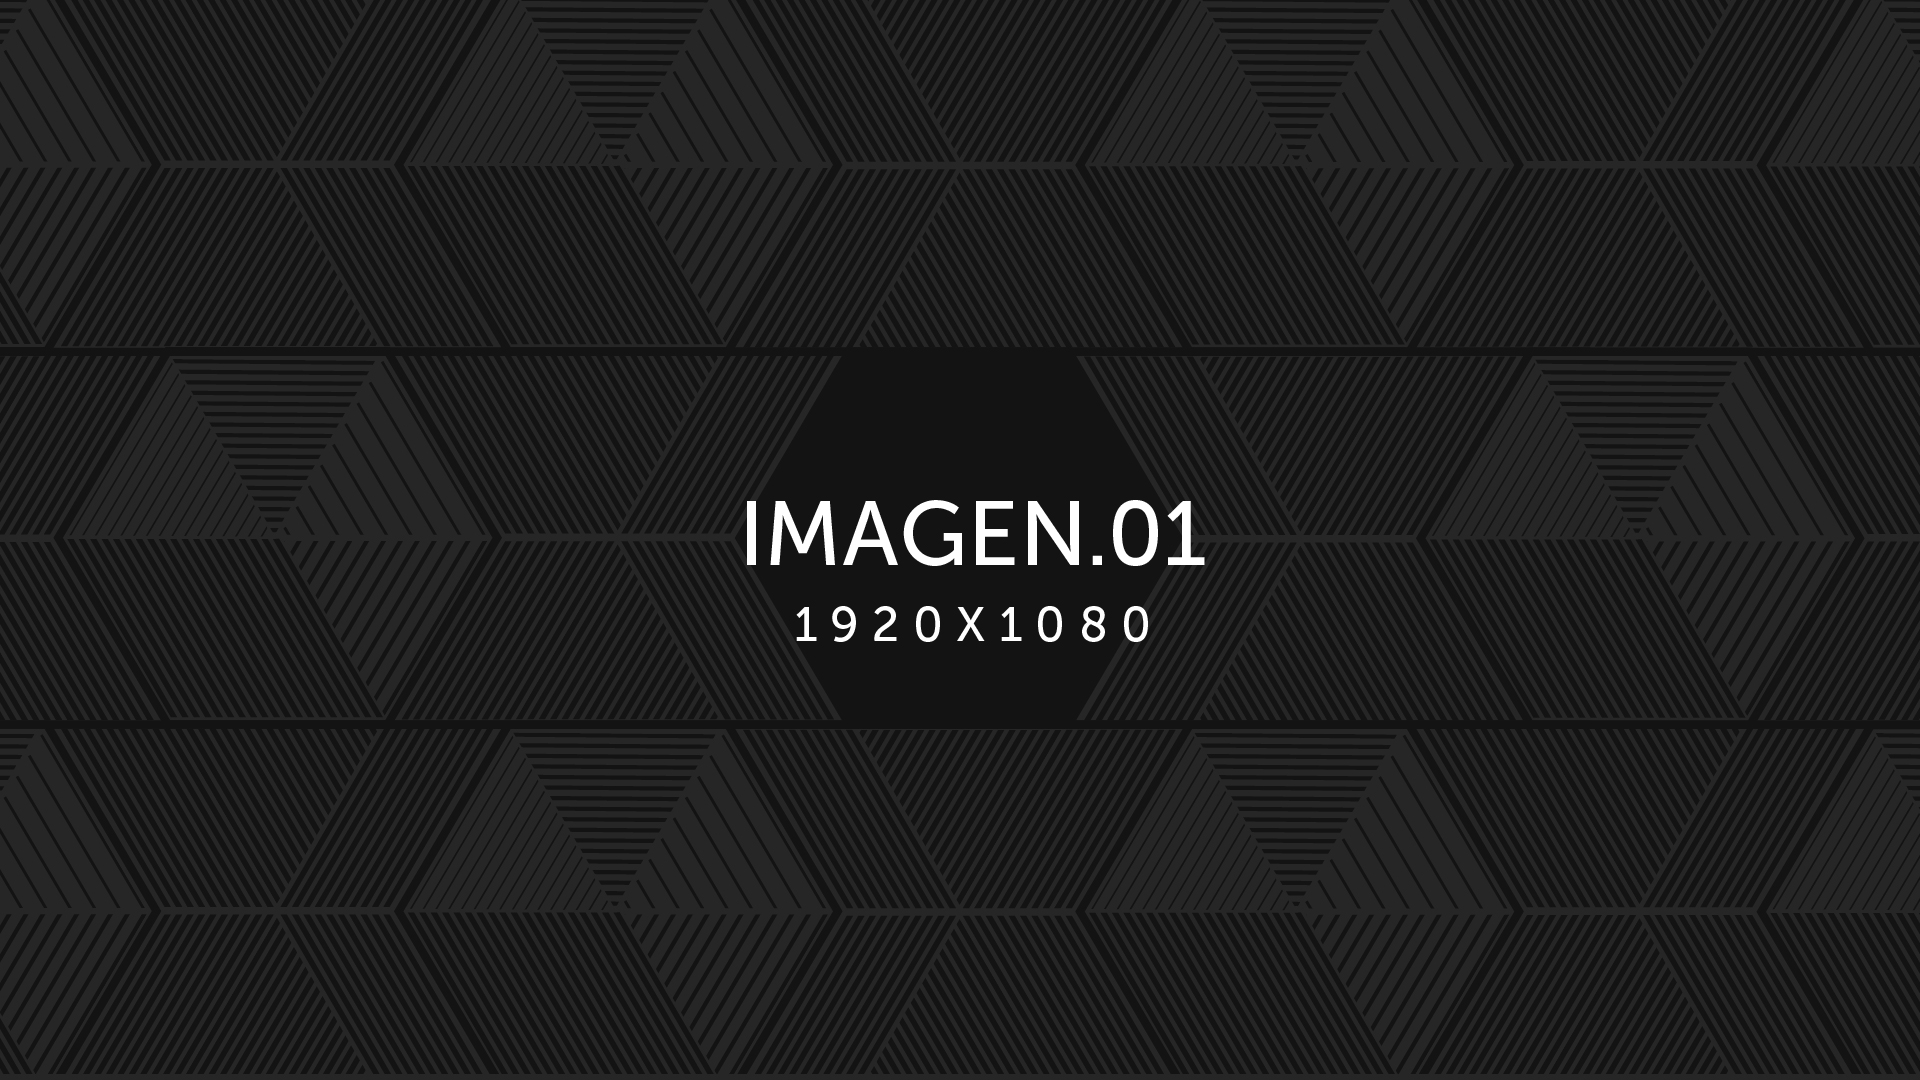 PB_Imagen01_1920x1080.jpg